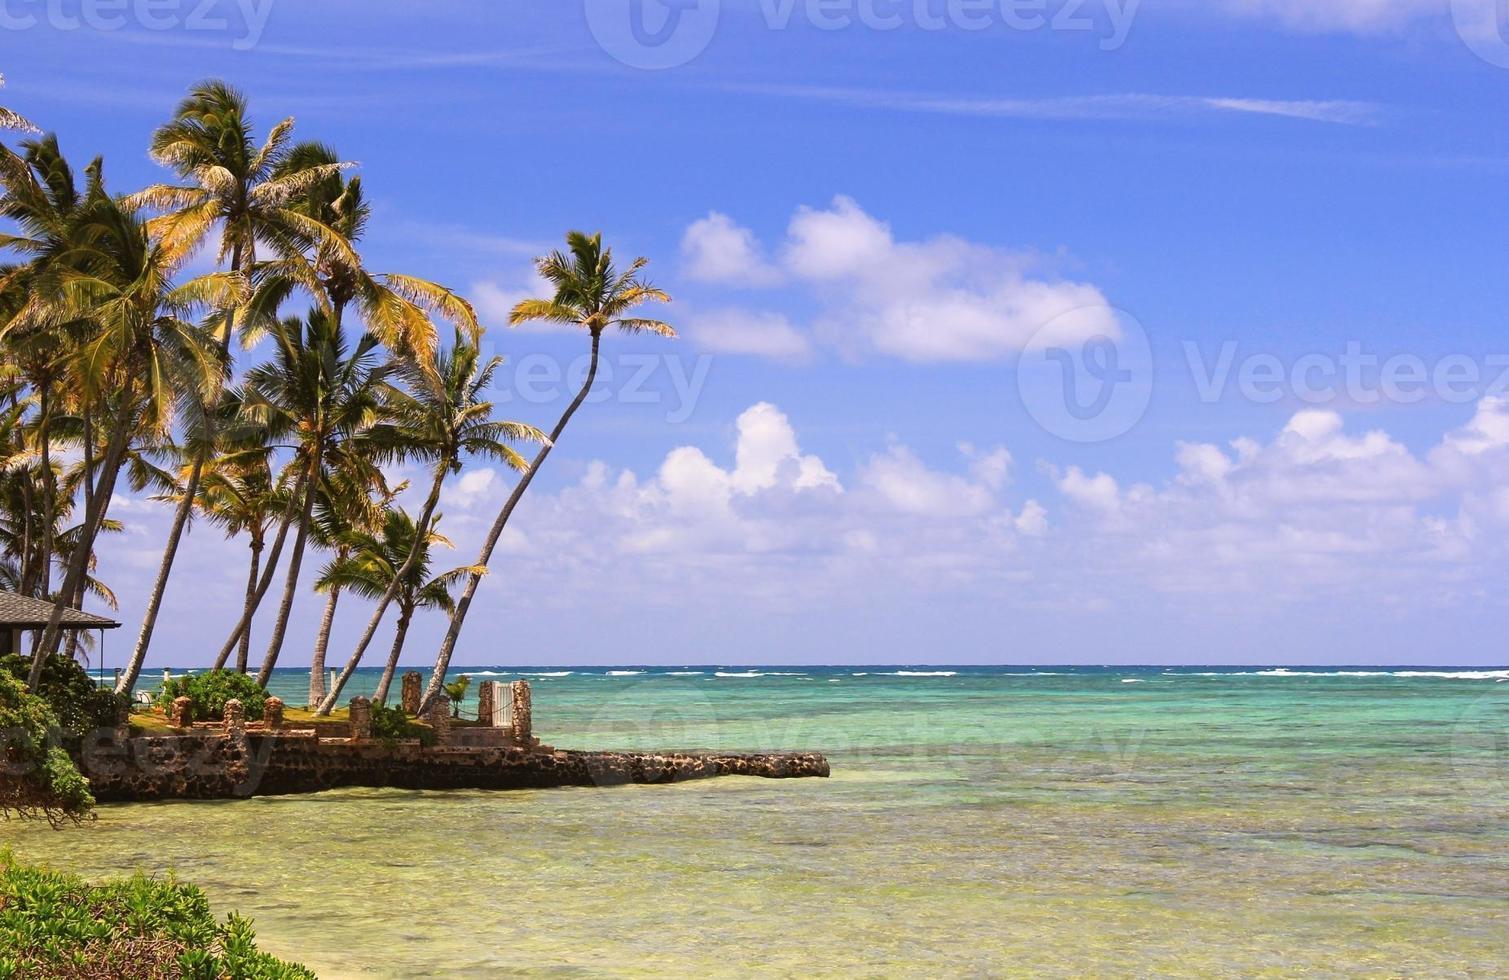 oahu hawaii pacific ocean palm tree beach scenic foto